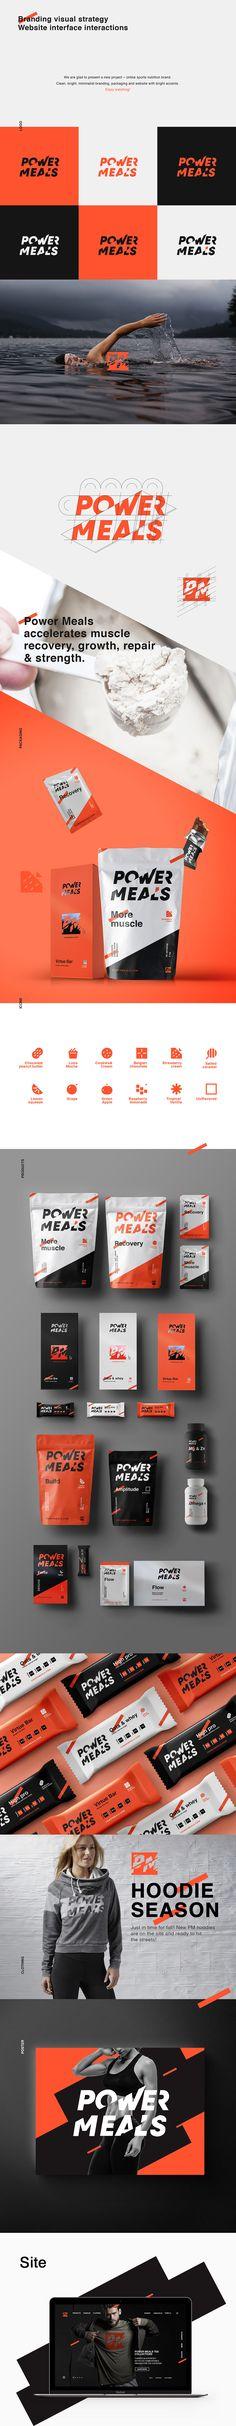 Branding visual strategyWebsite interface interactions